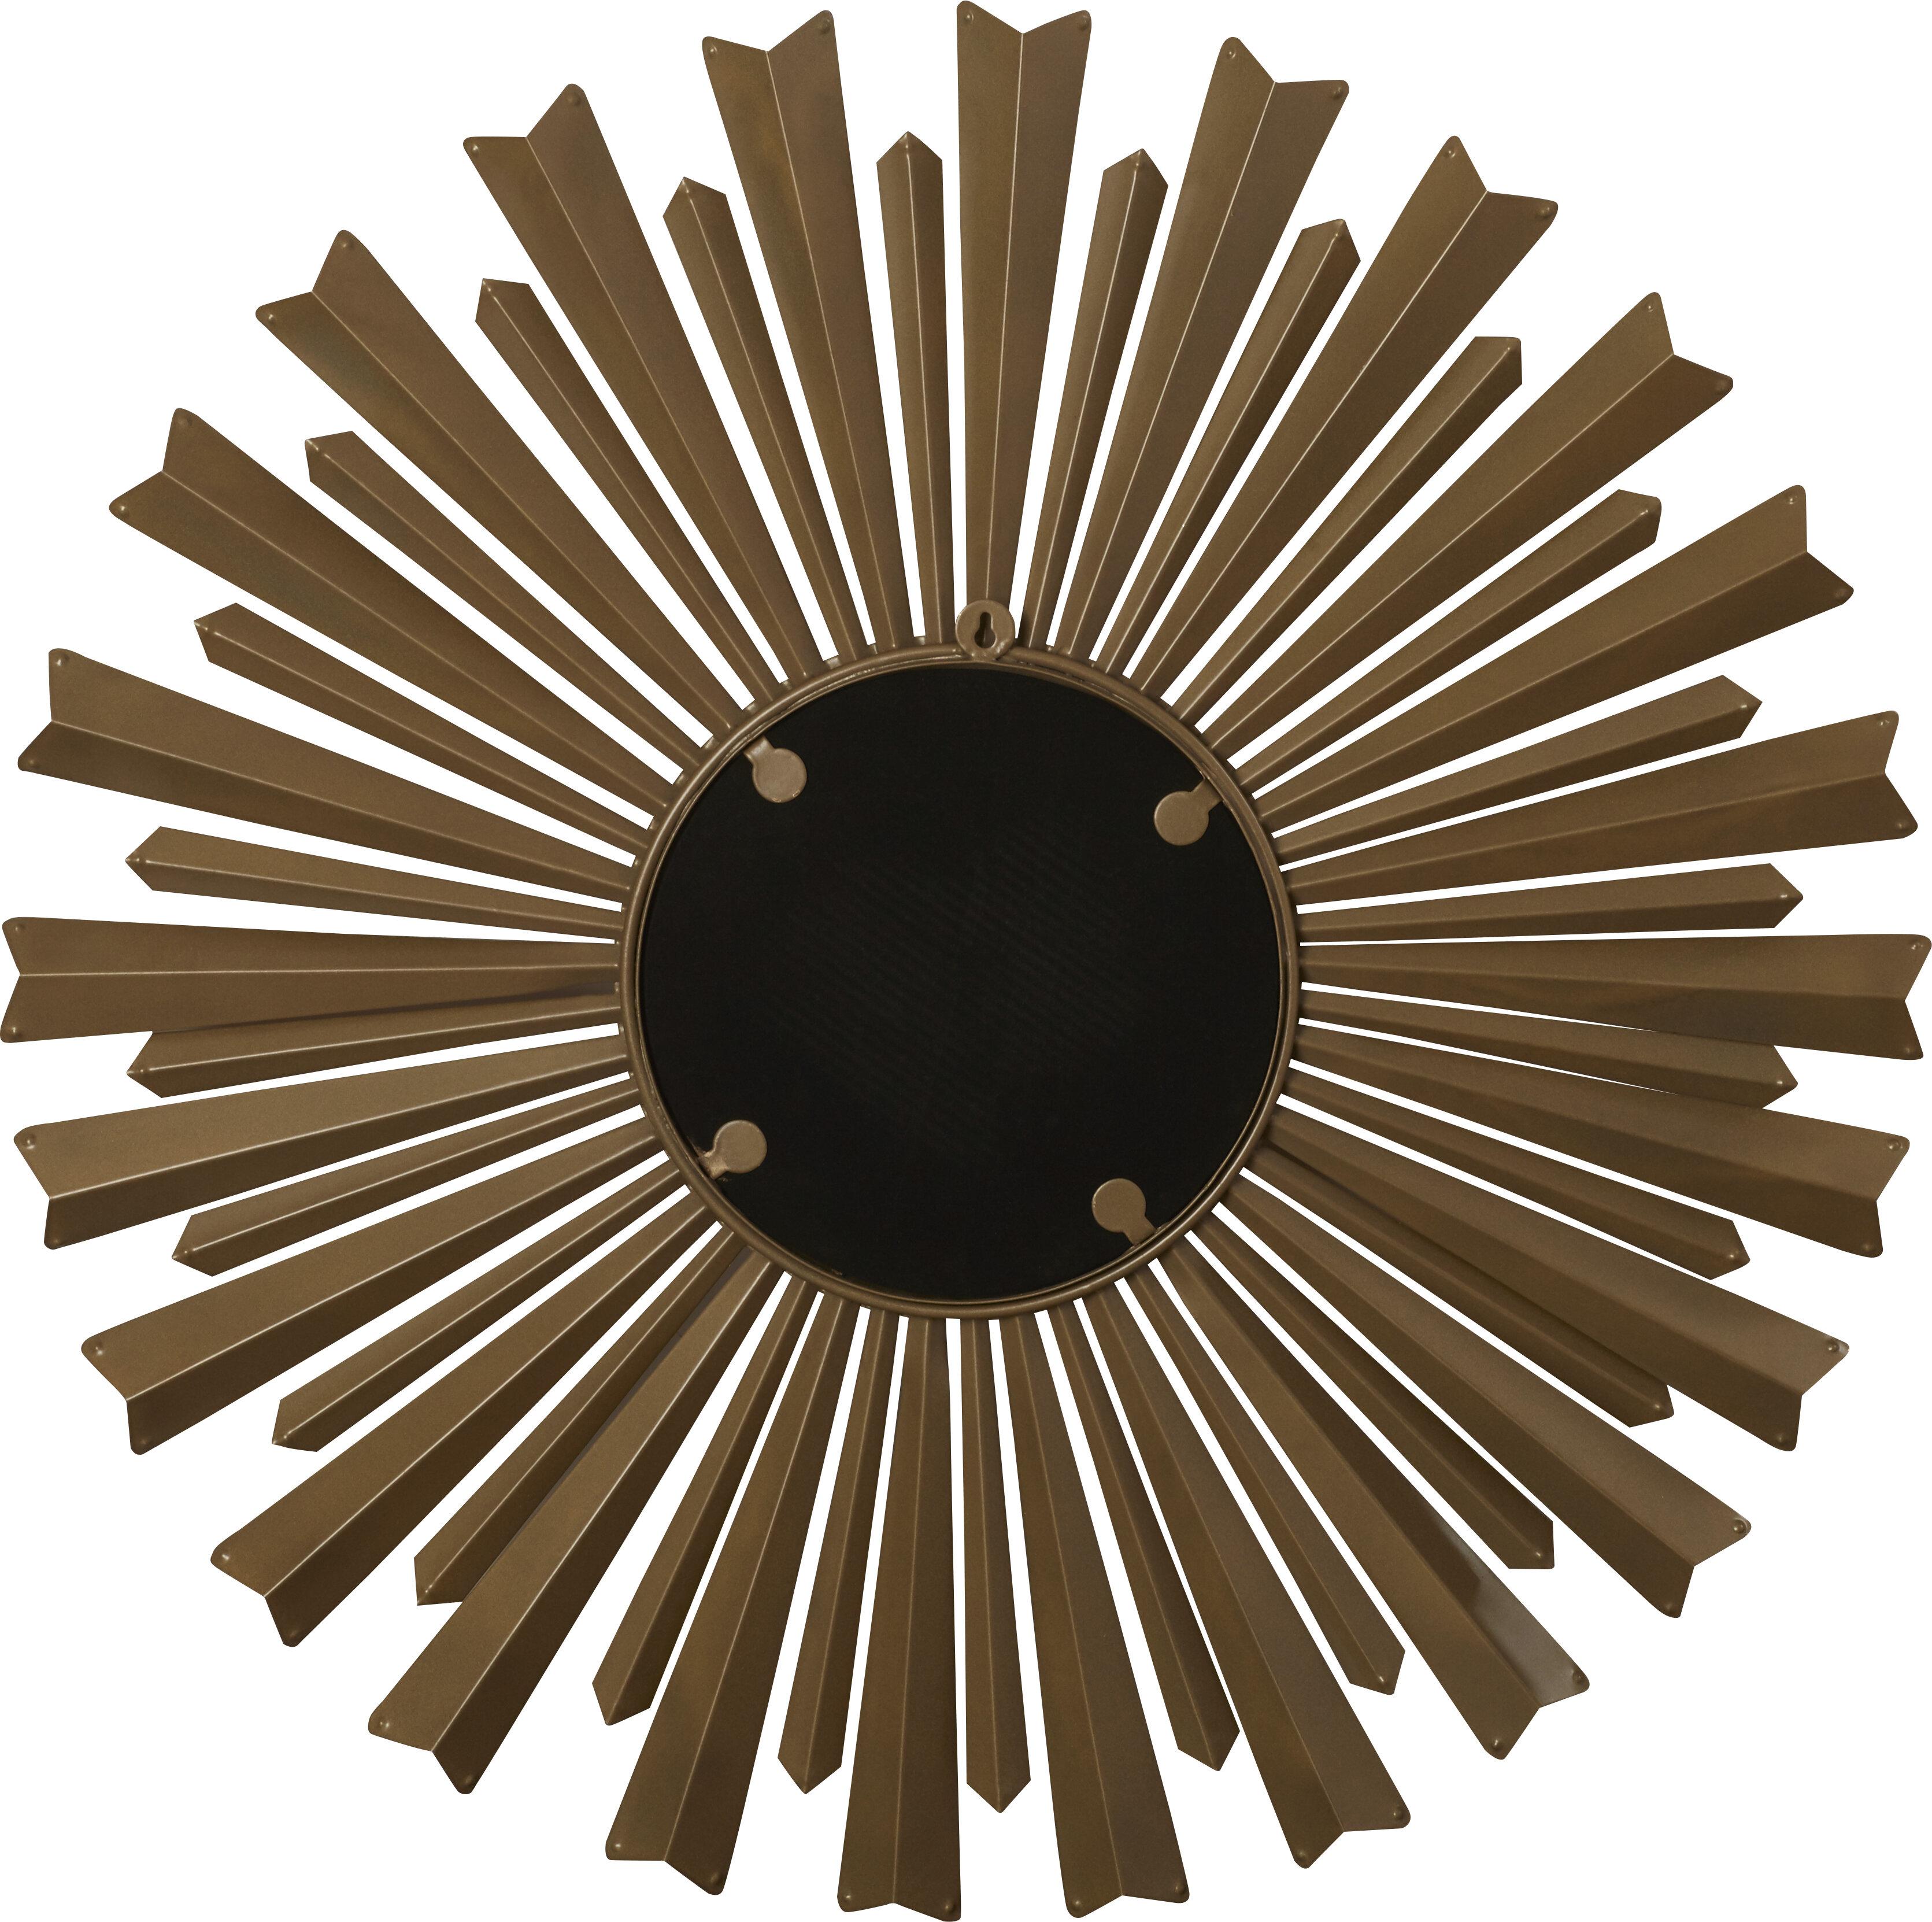 Willa Arlo Interiors Birksgate Sunburst Accent Mirror Intended For Birksgate Sunburst Accent Mirrors (View 7 of 20)